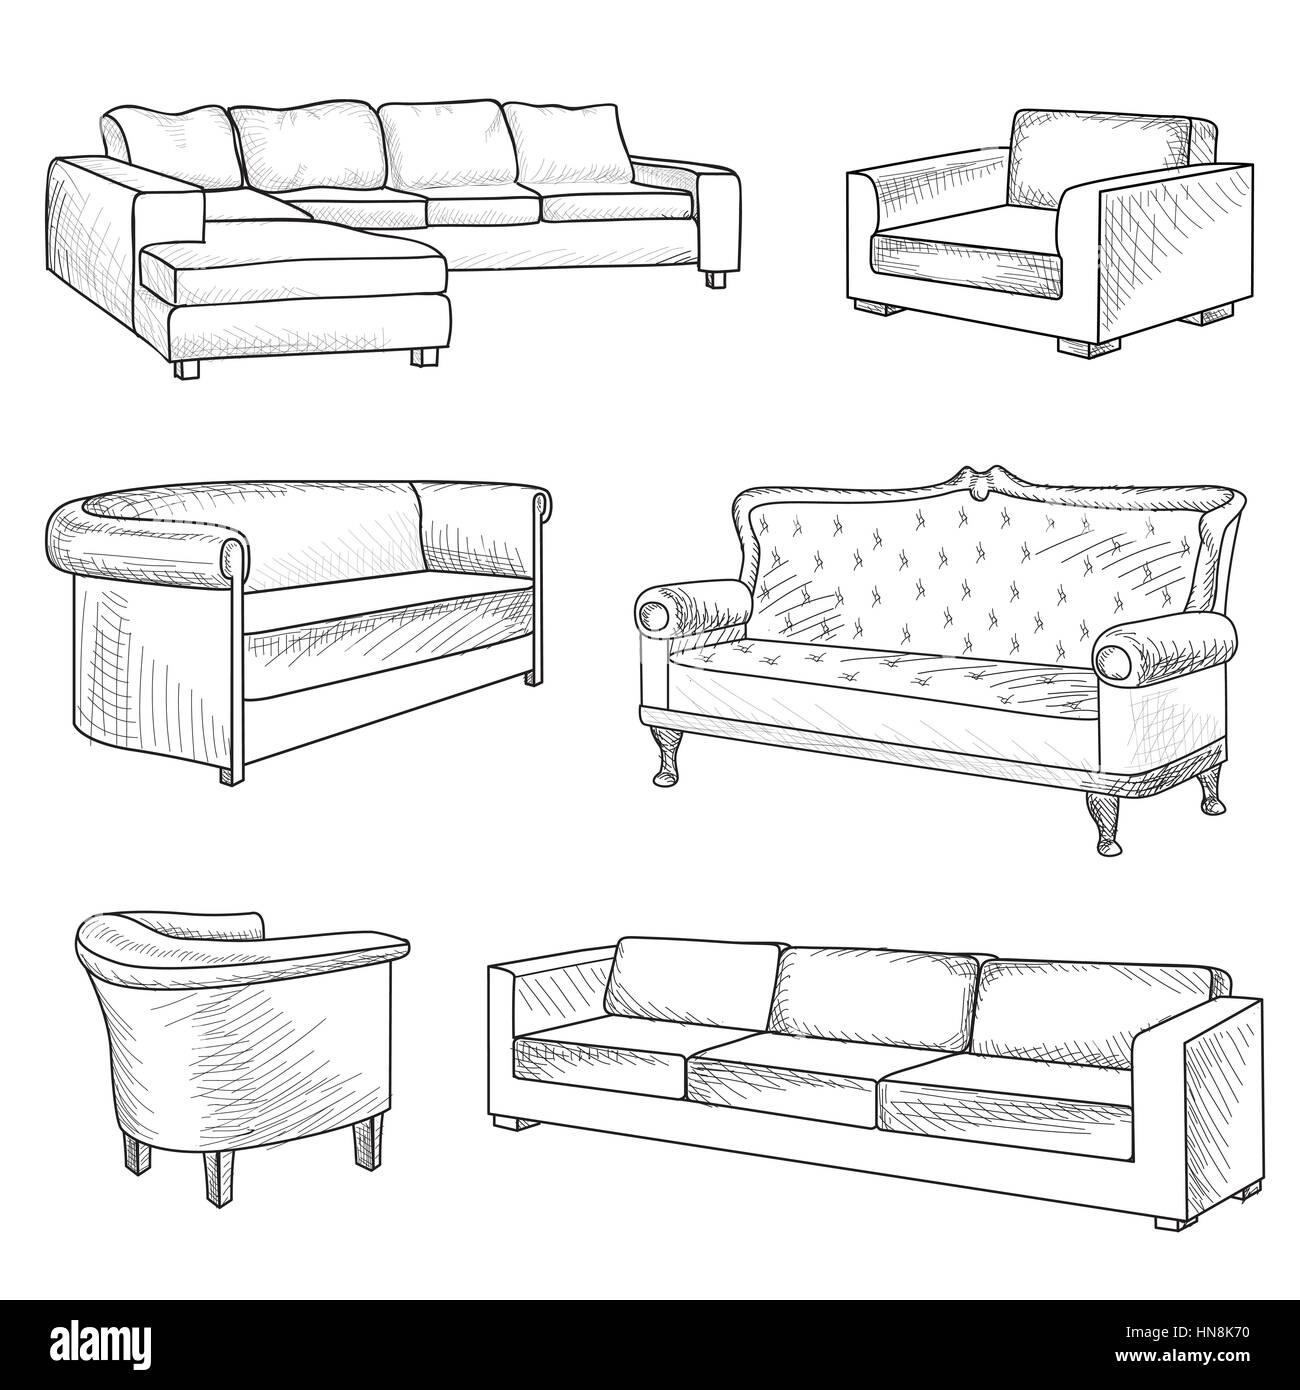 Furniture Set Interior Detail Outline Sketch Collection Bed Sofa